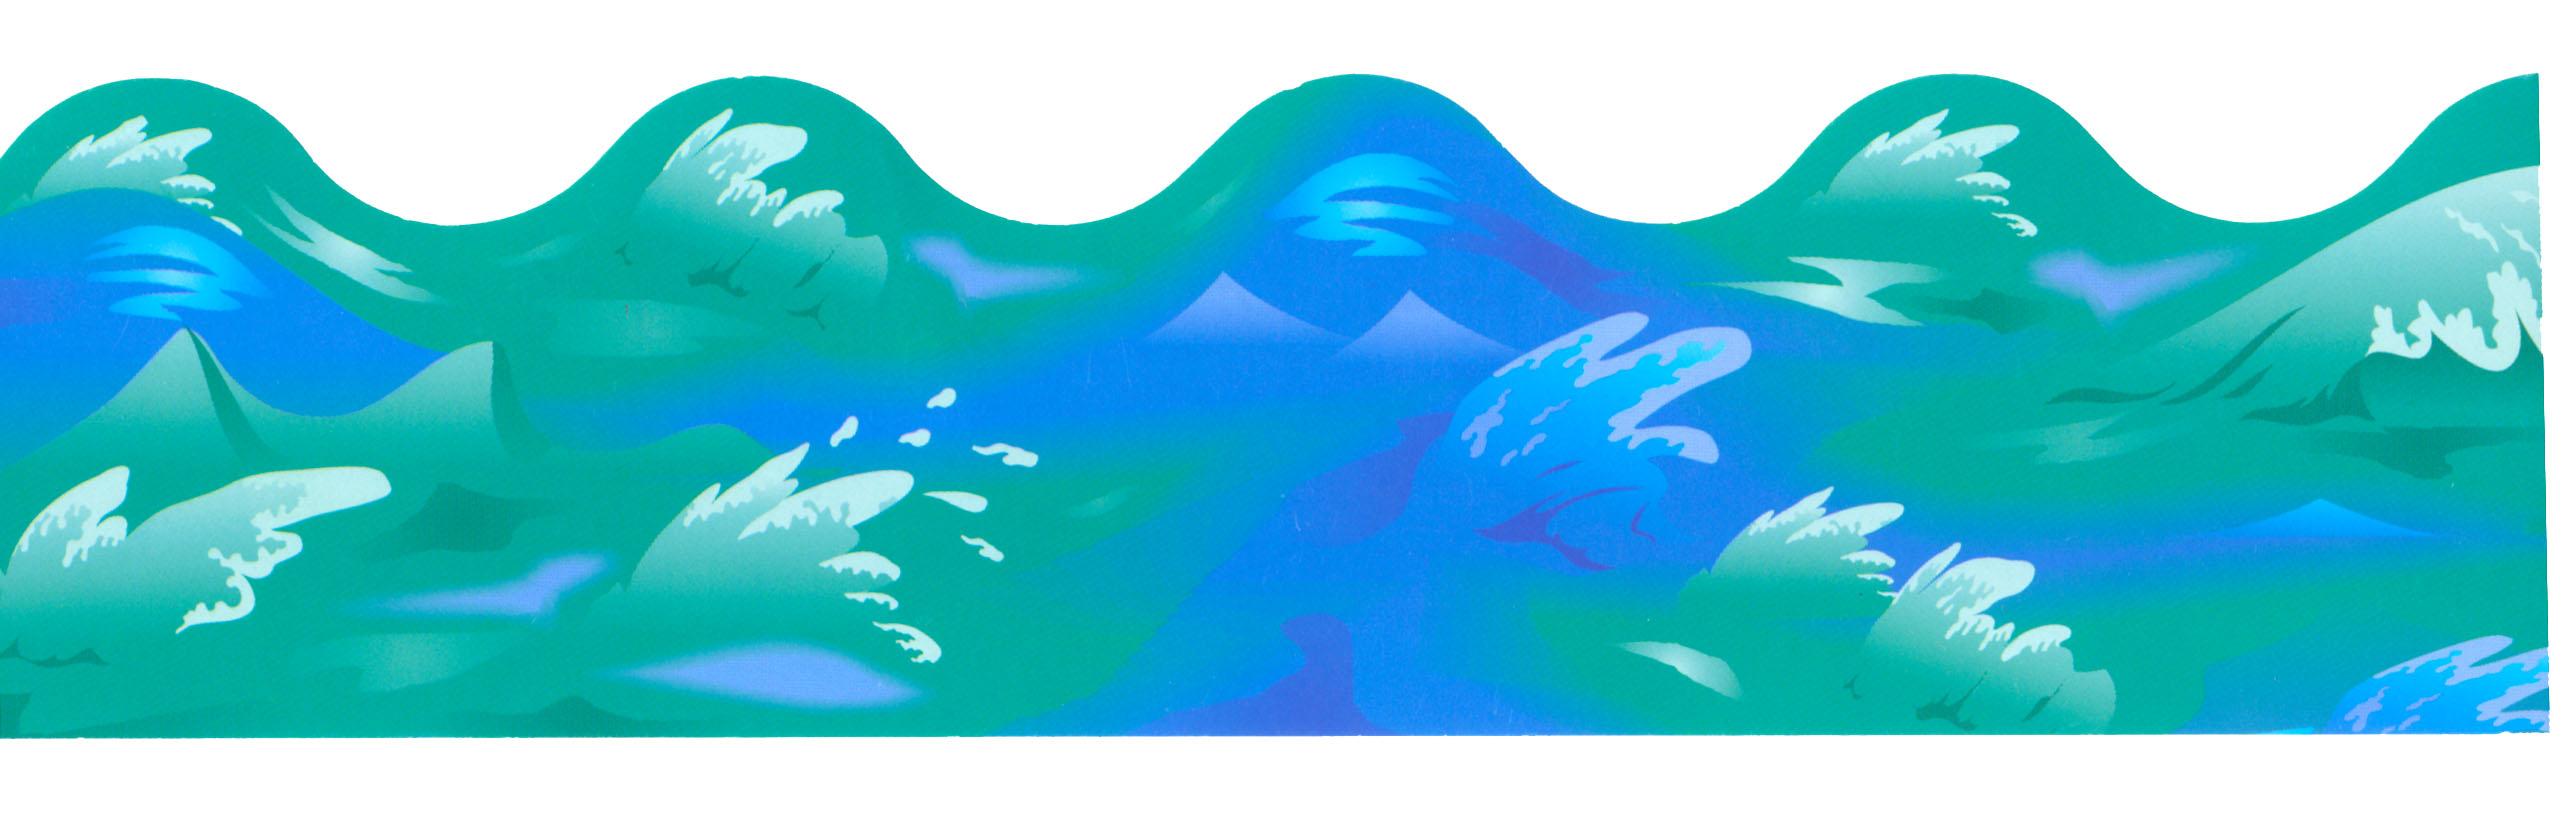 ocean clip art clipart panda free clipart images rh clipartpanda com ocean border clipart free free ocean clipart images